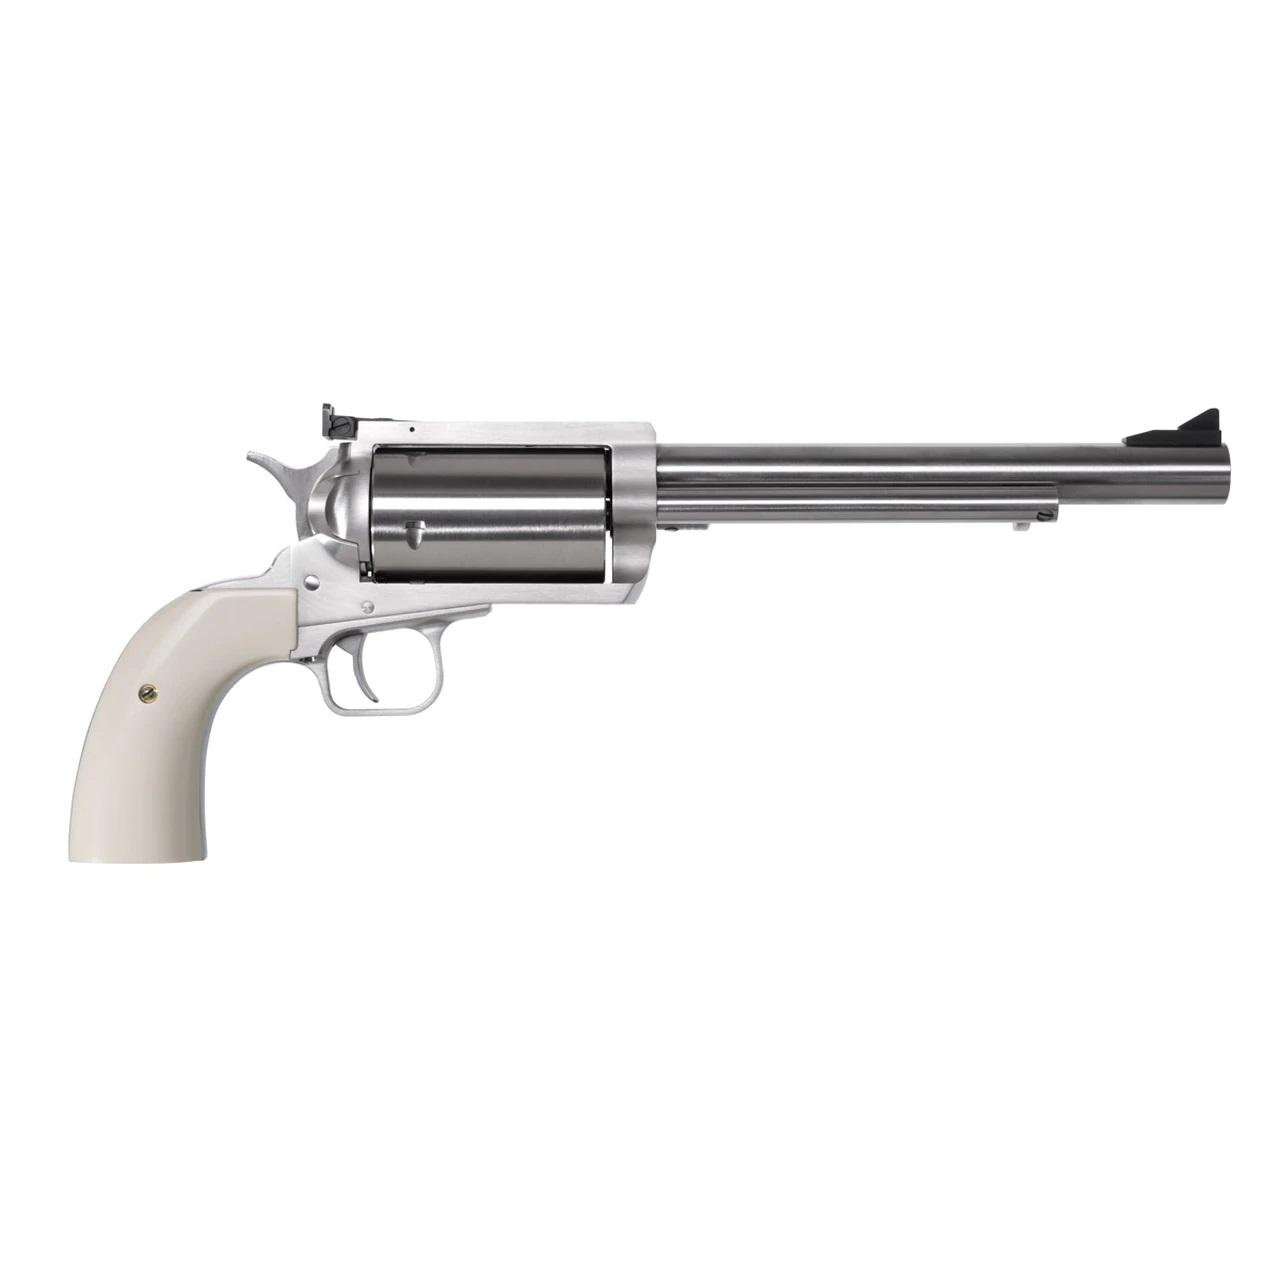 Magnum Research BFR Revolver 500 S&W Magnum